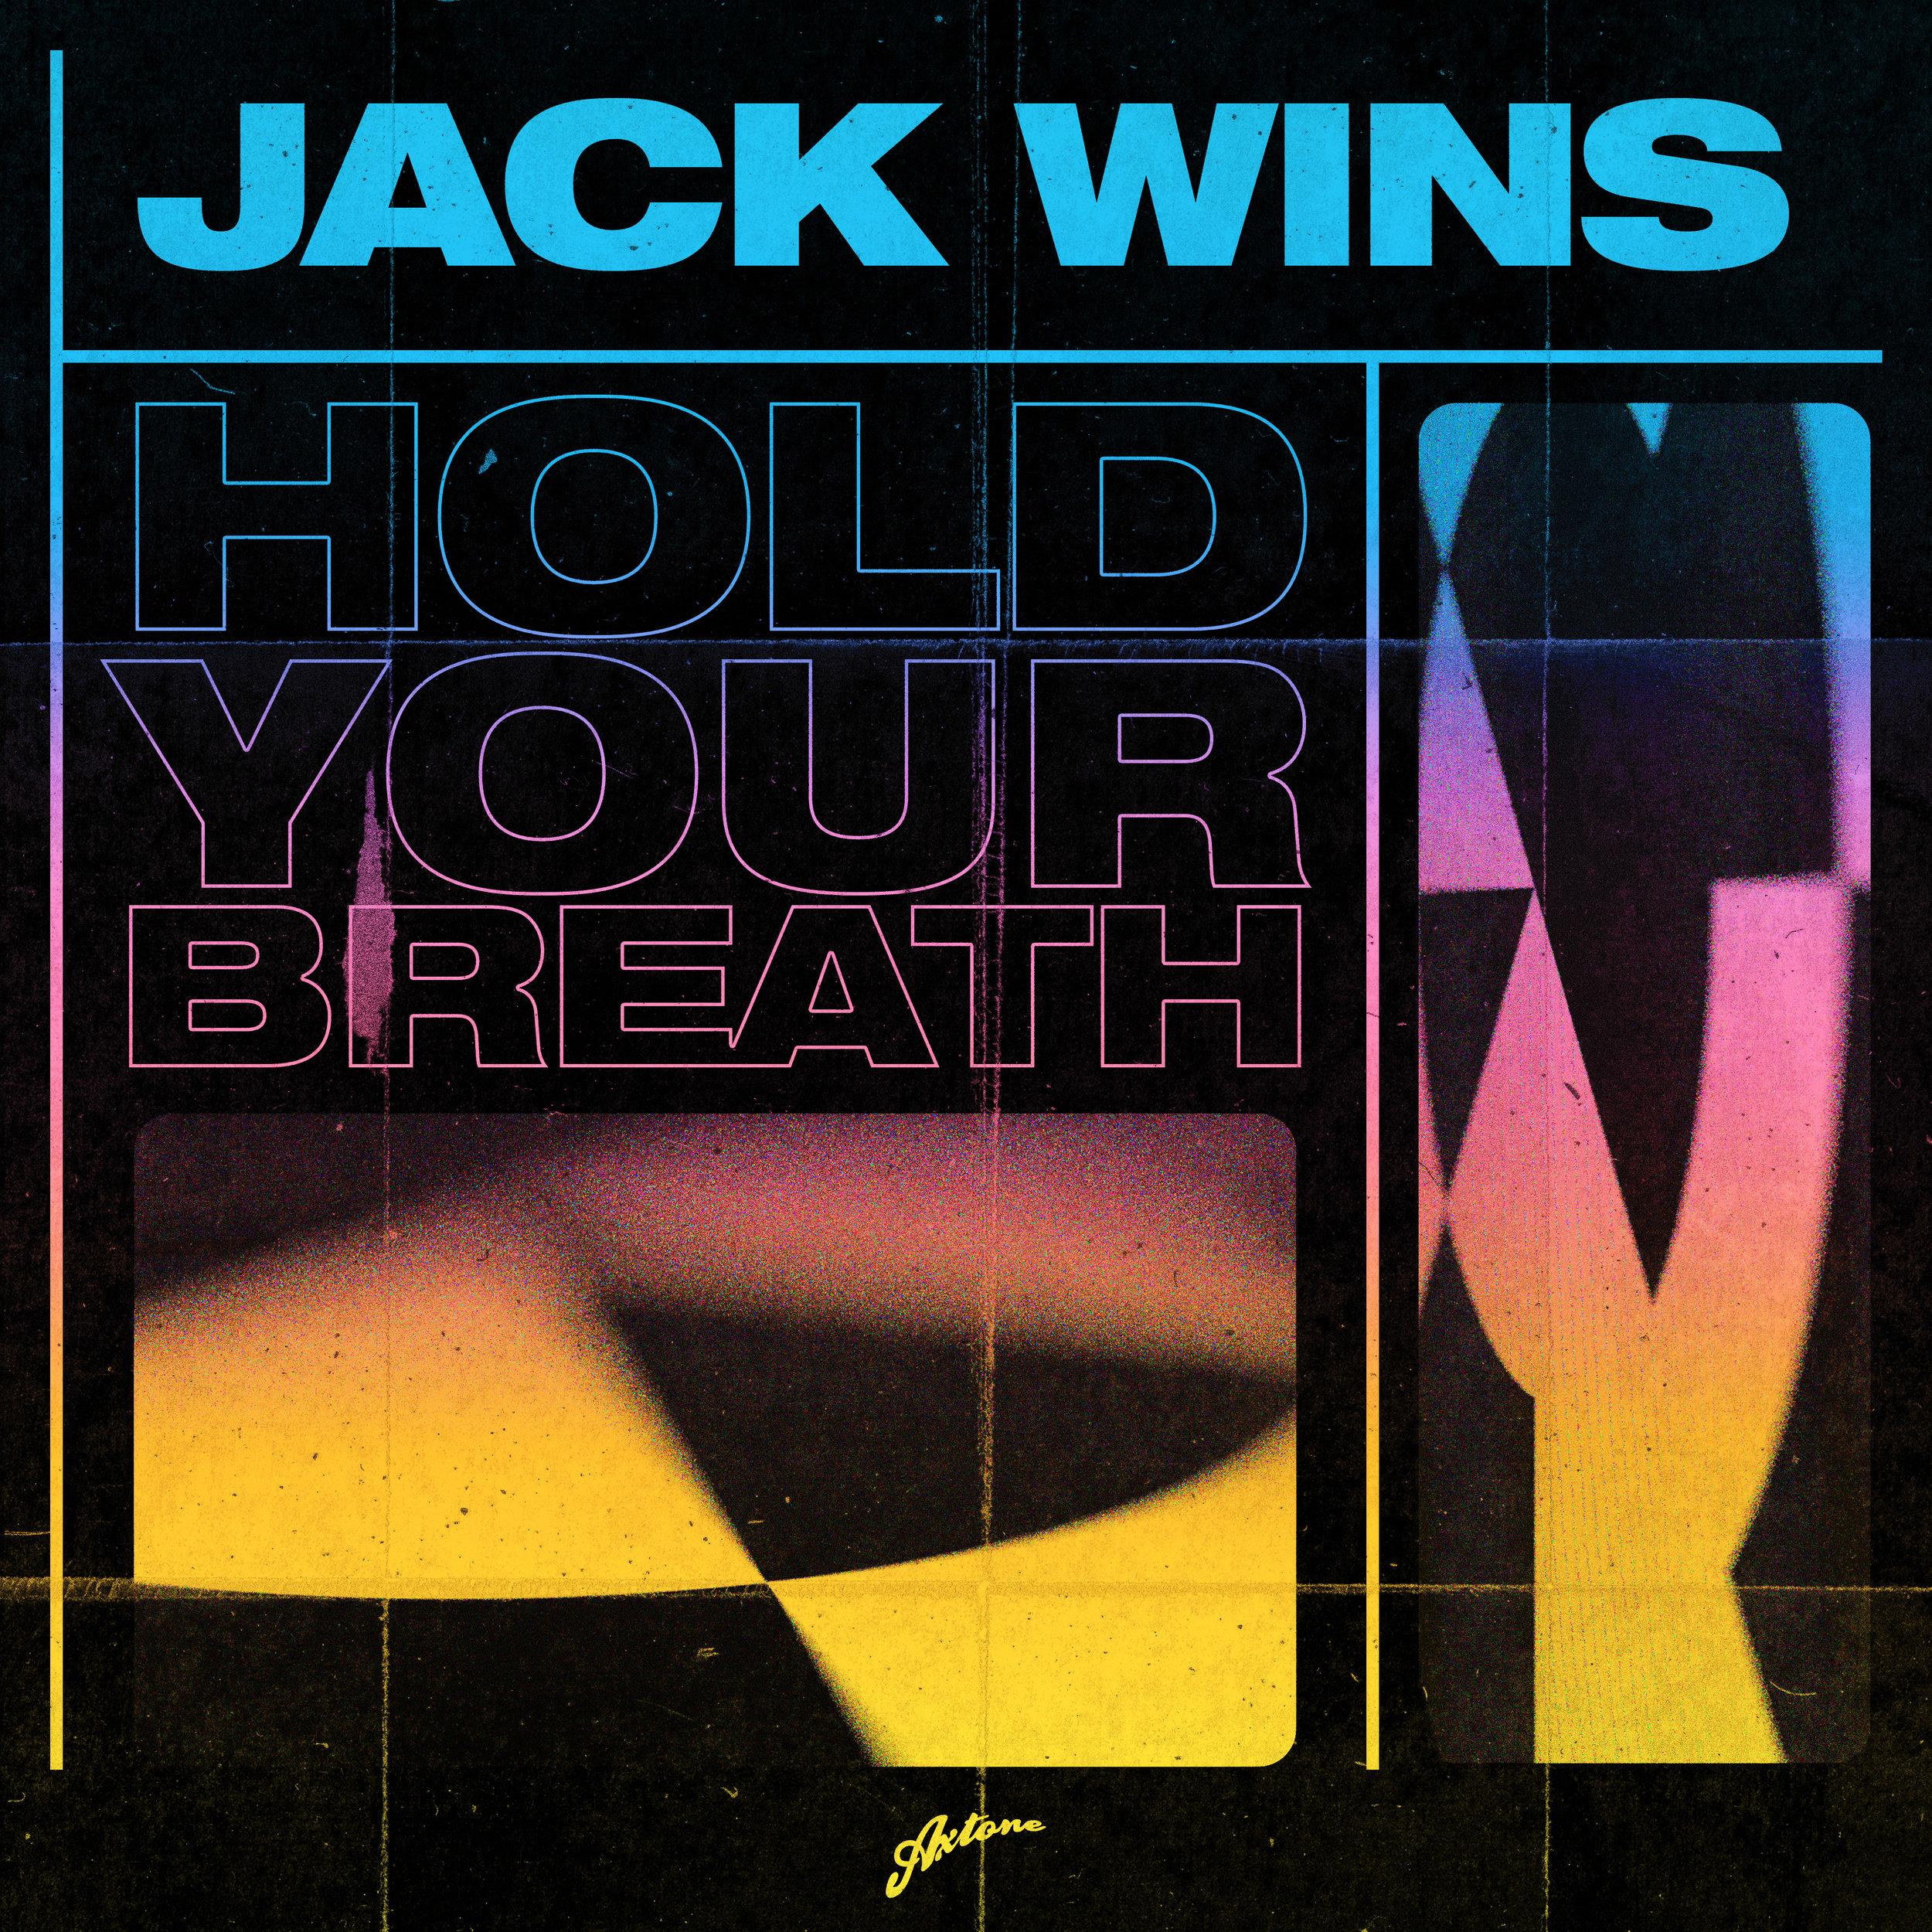 hold_your_breath_4000.jpg